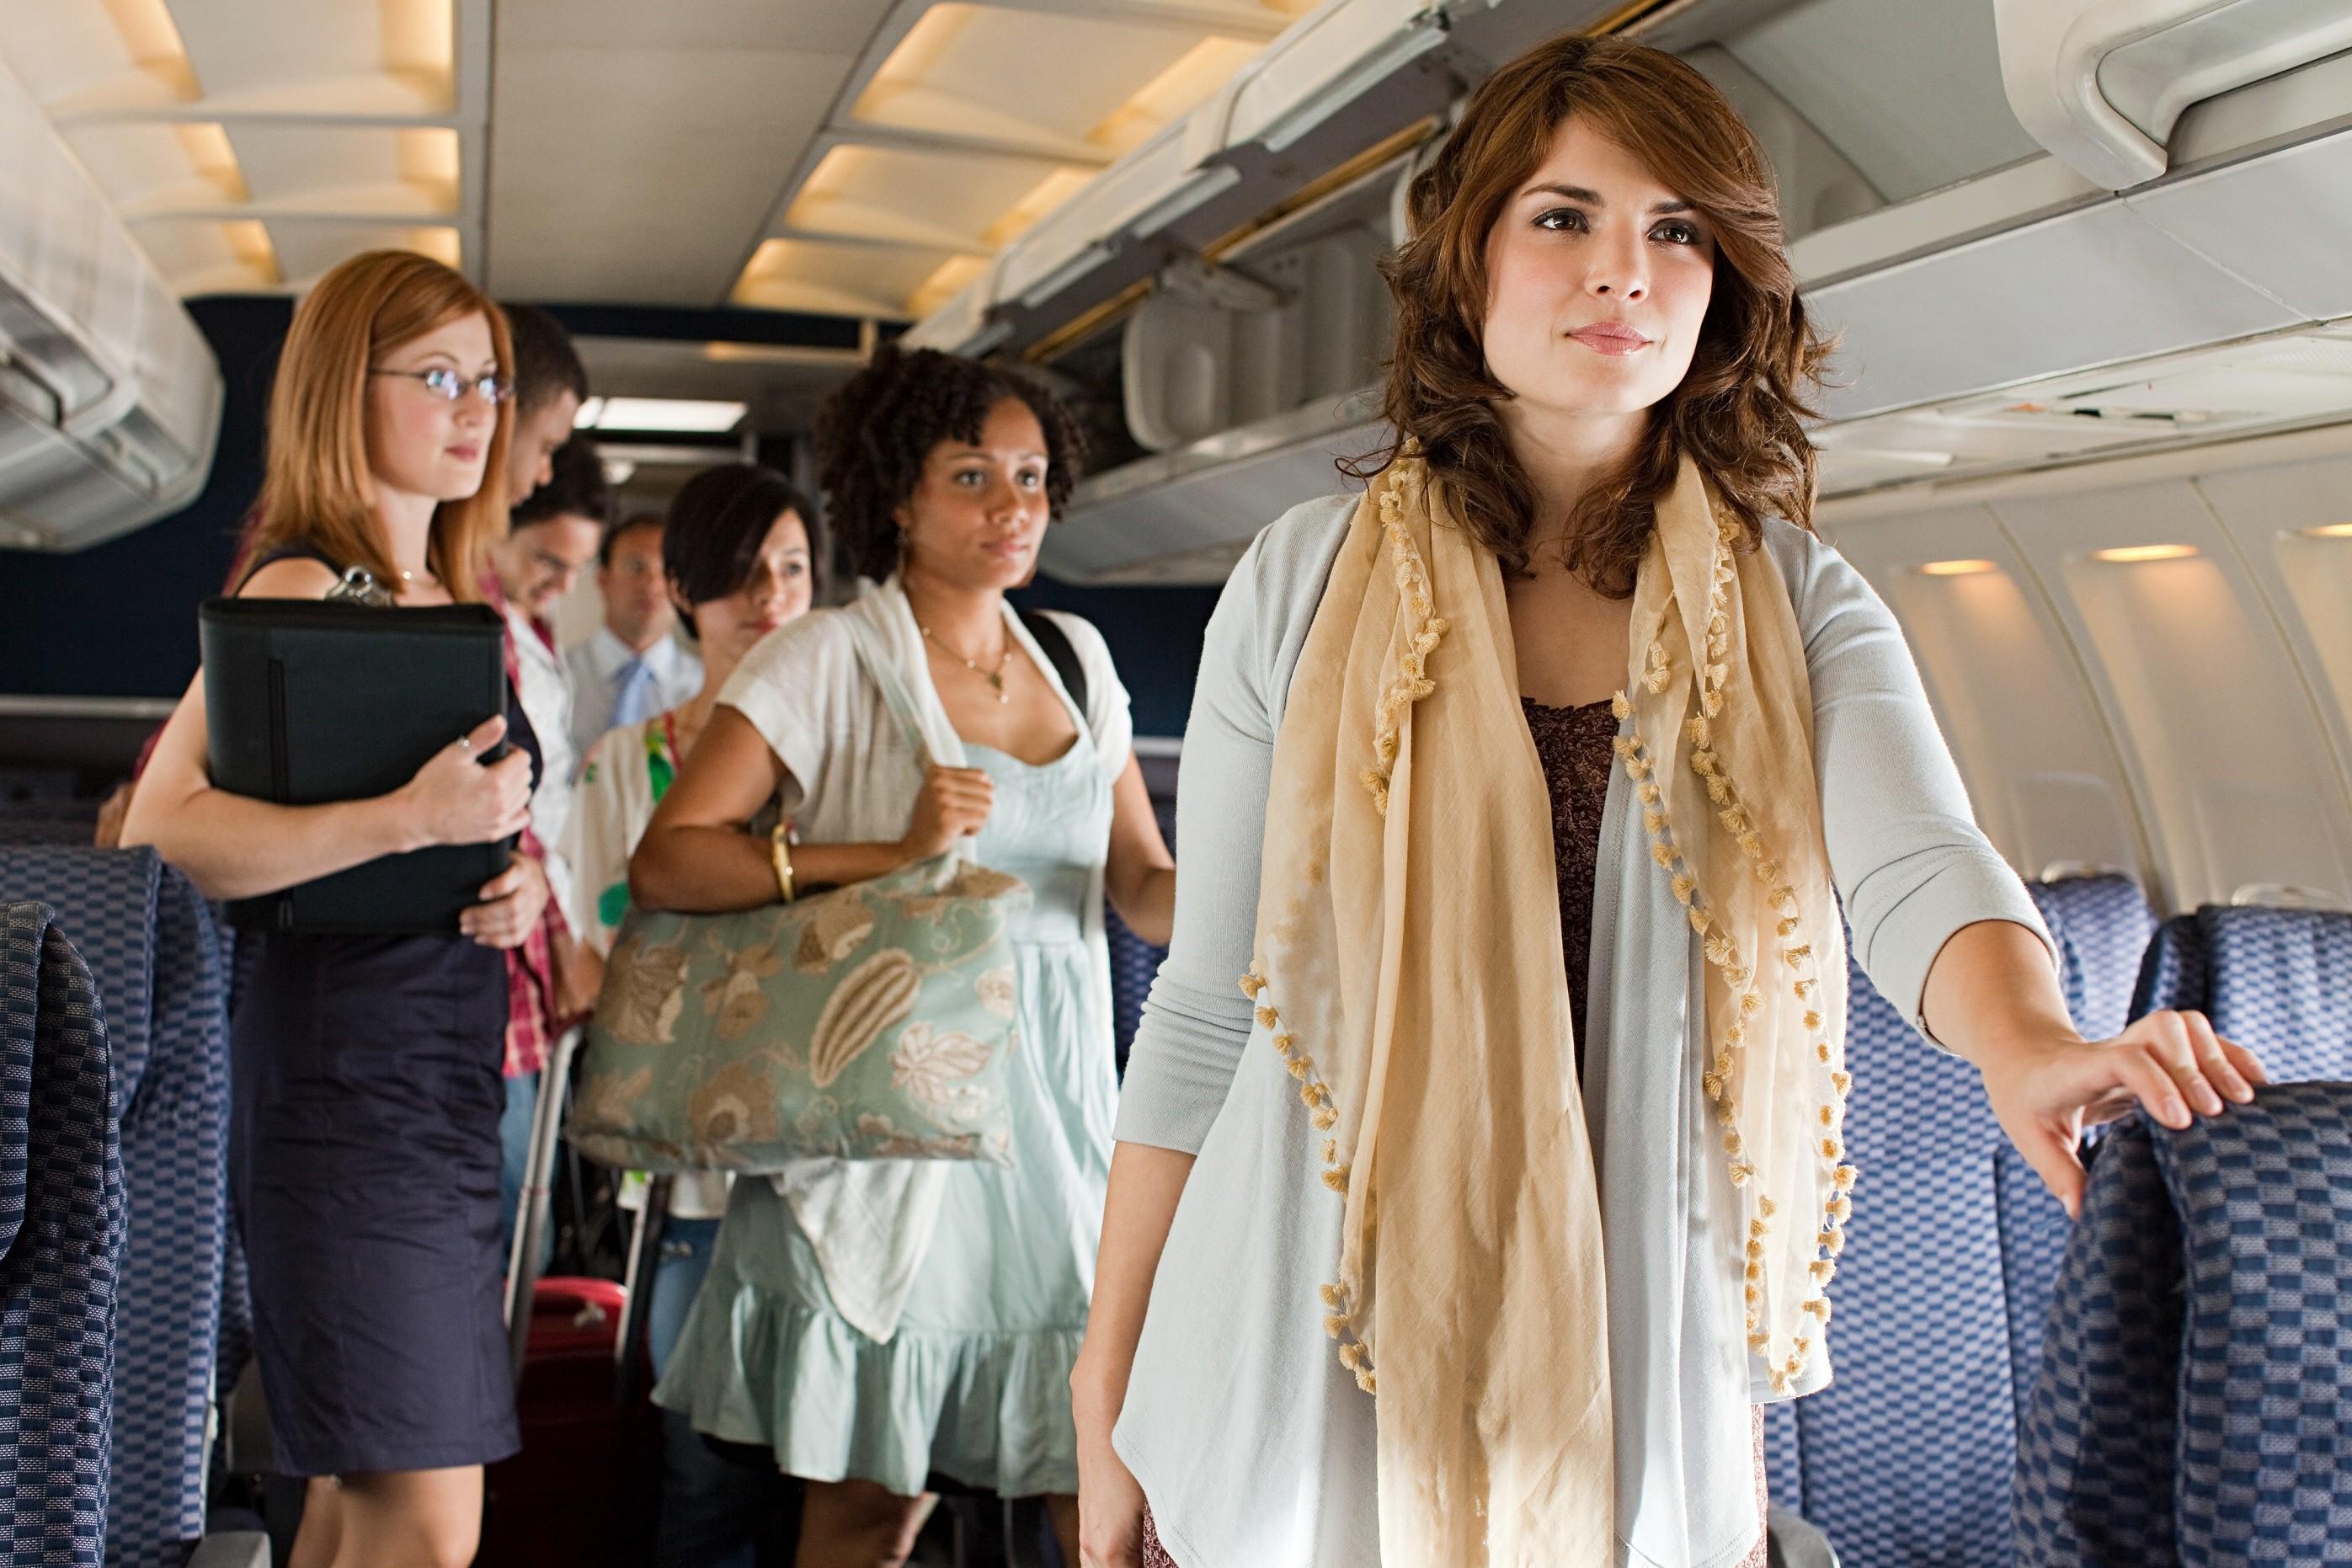 Women standing in a plane